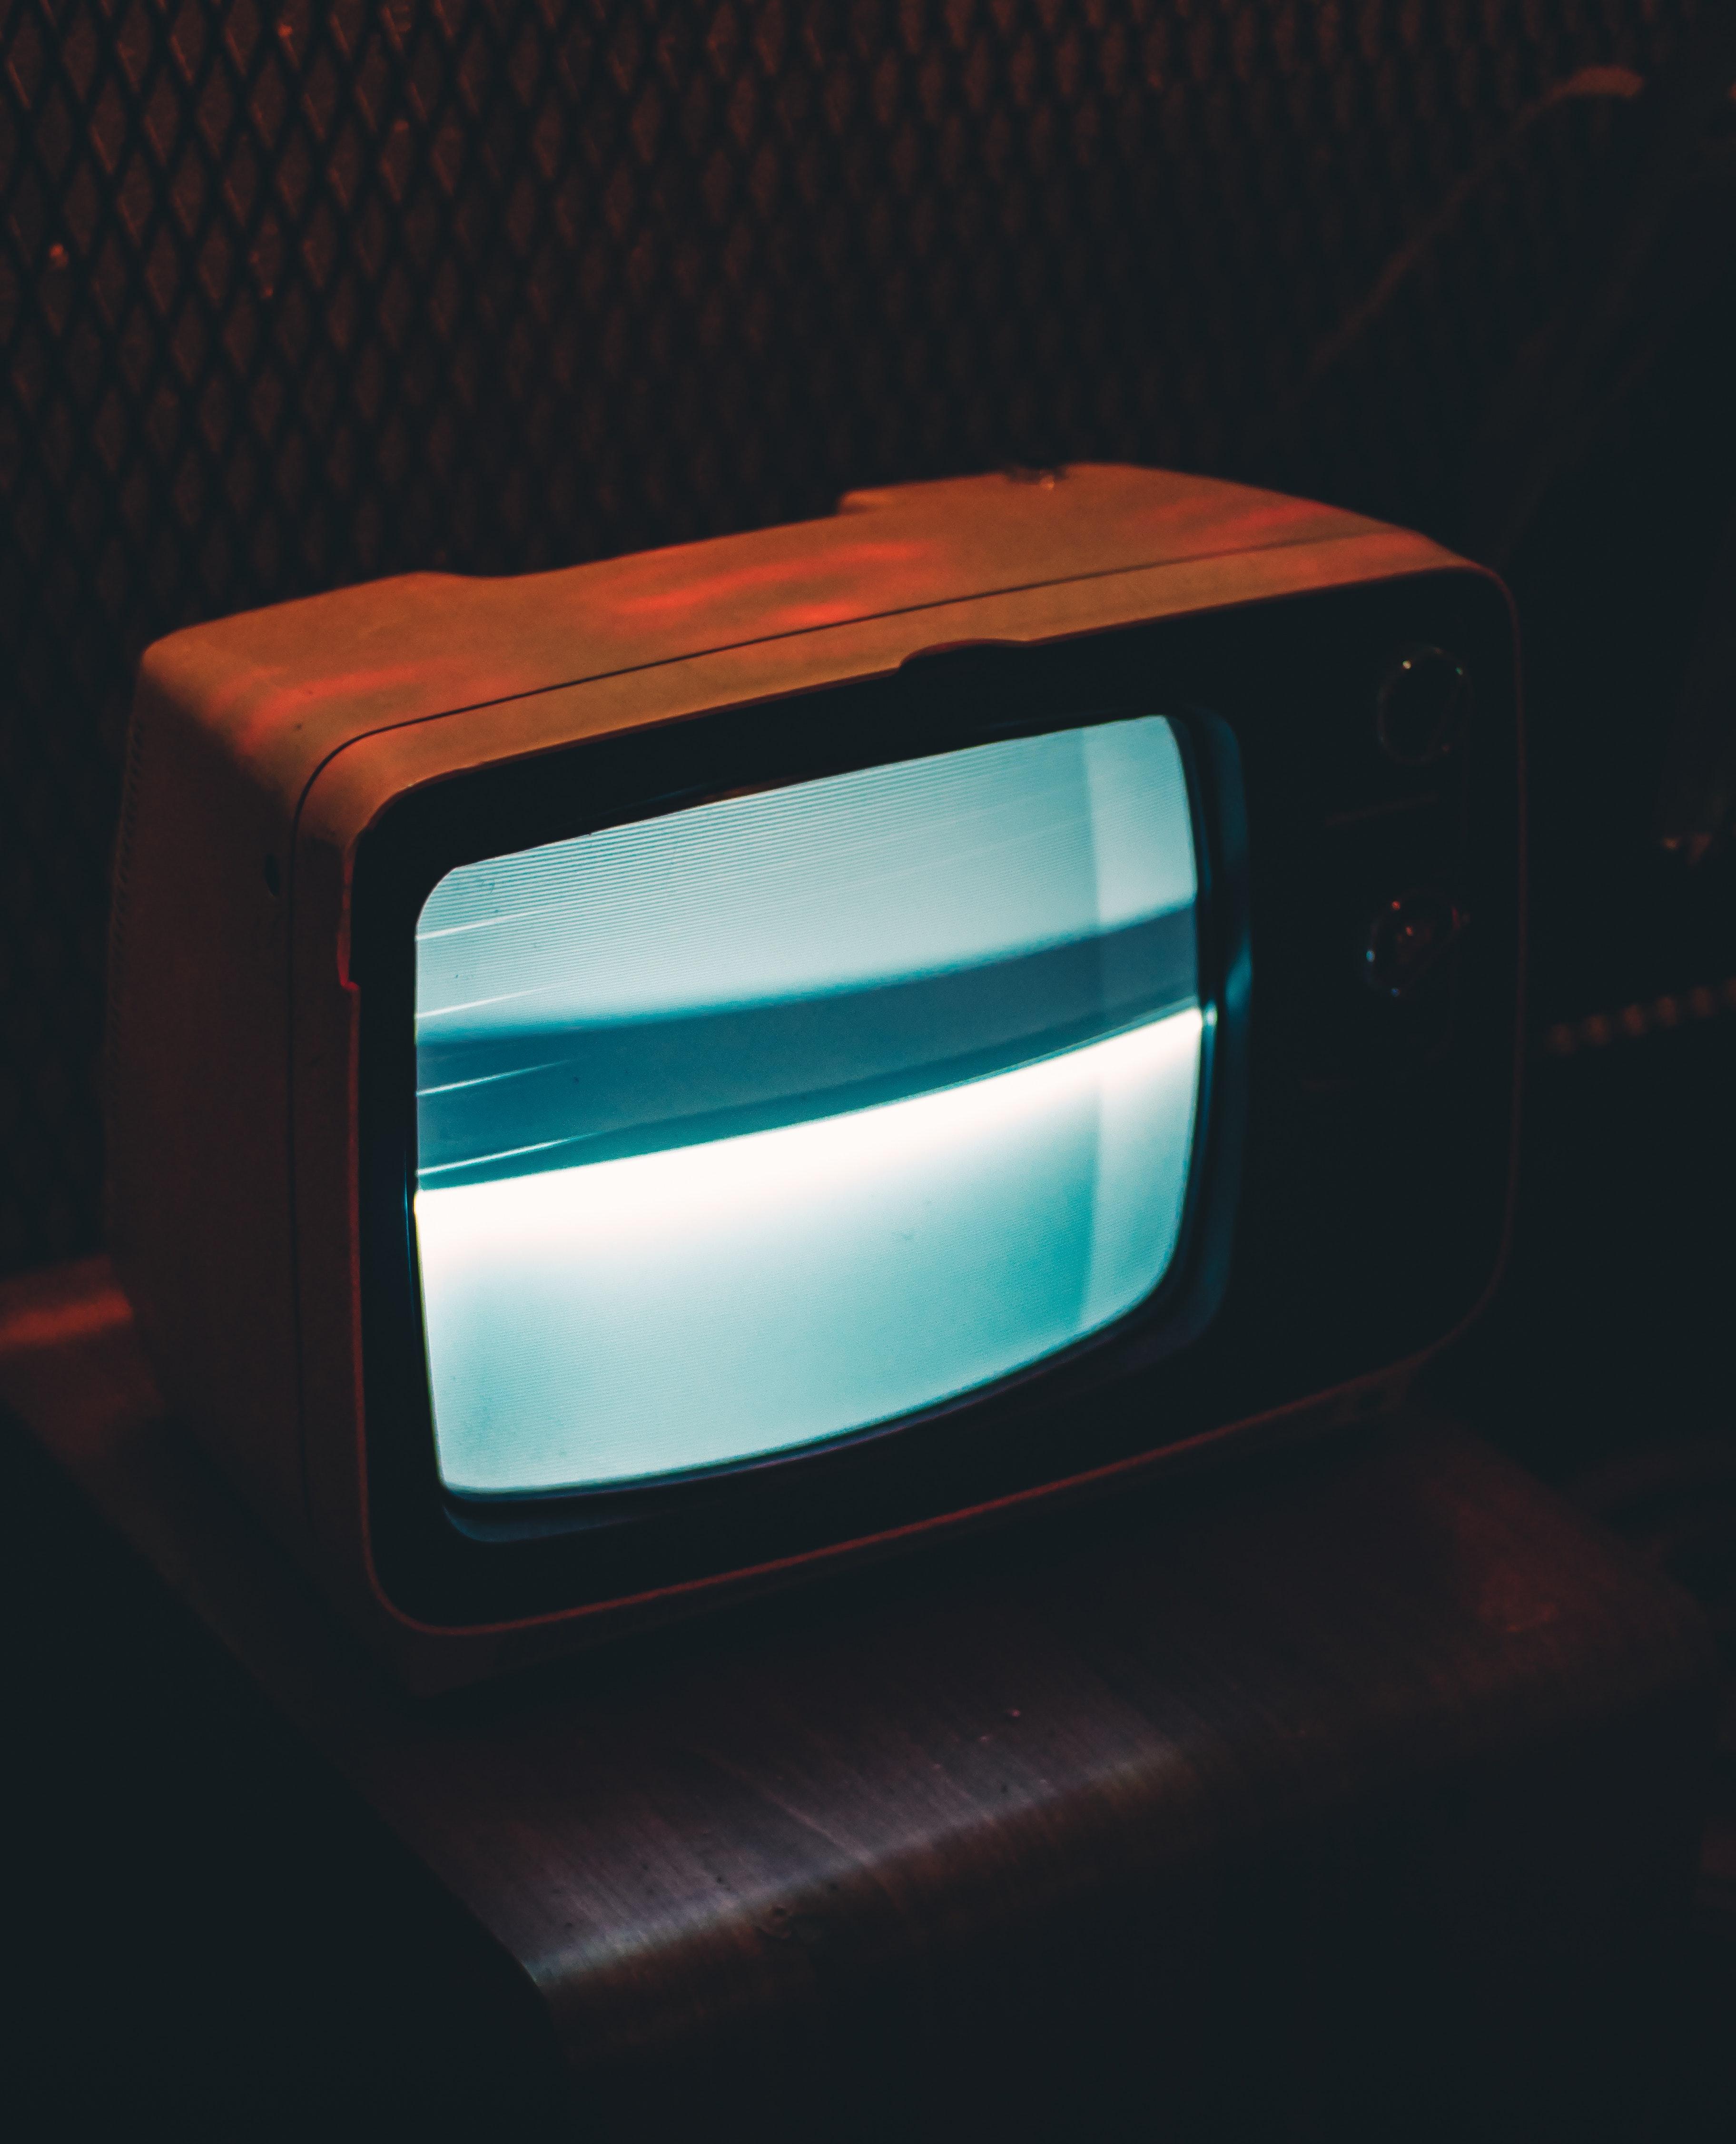 black-crt-tv-showing-gray-screen-704555 (1)